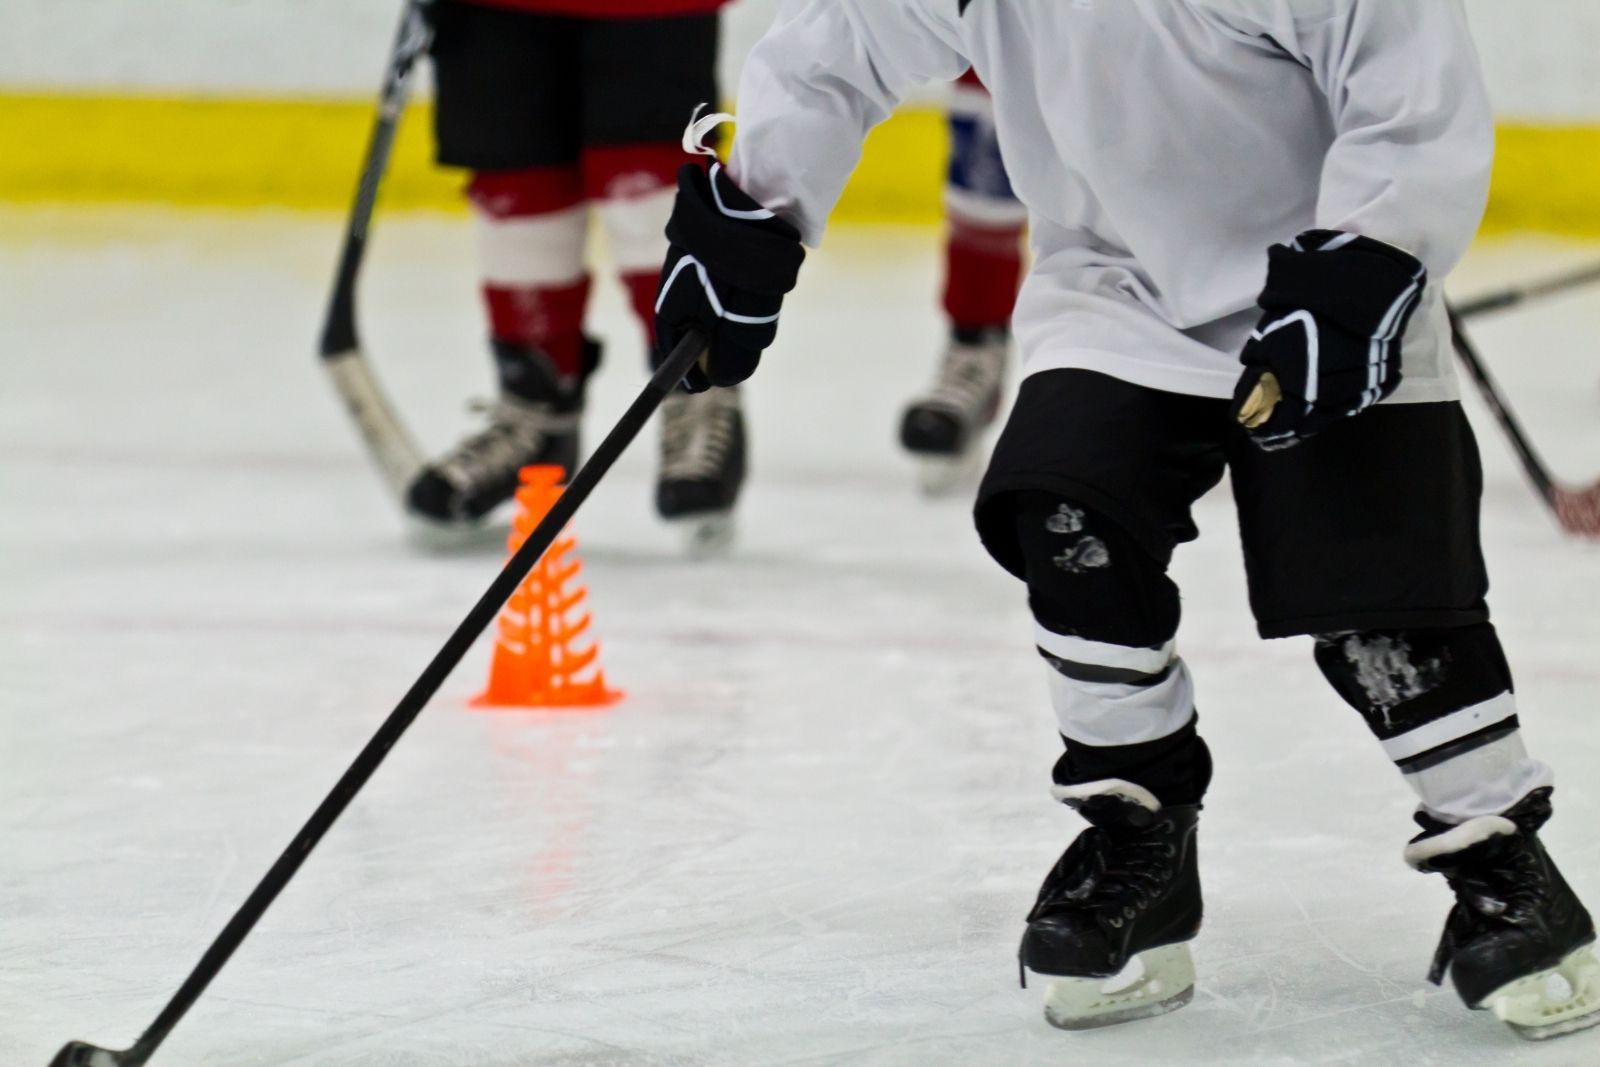 hockey drills 6 year olds